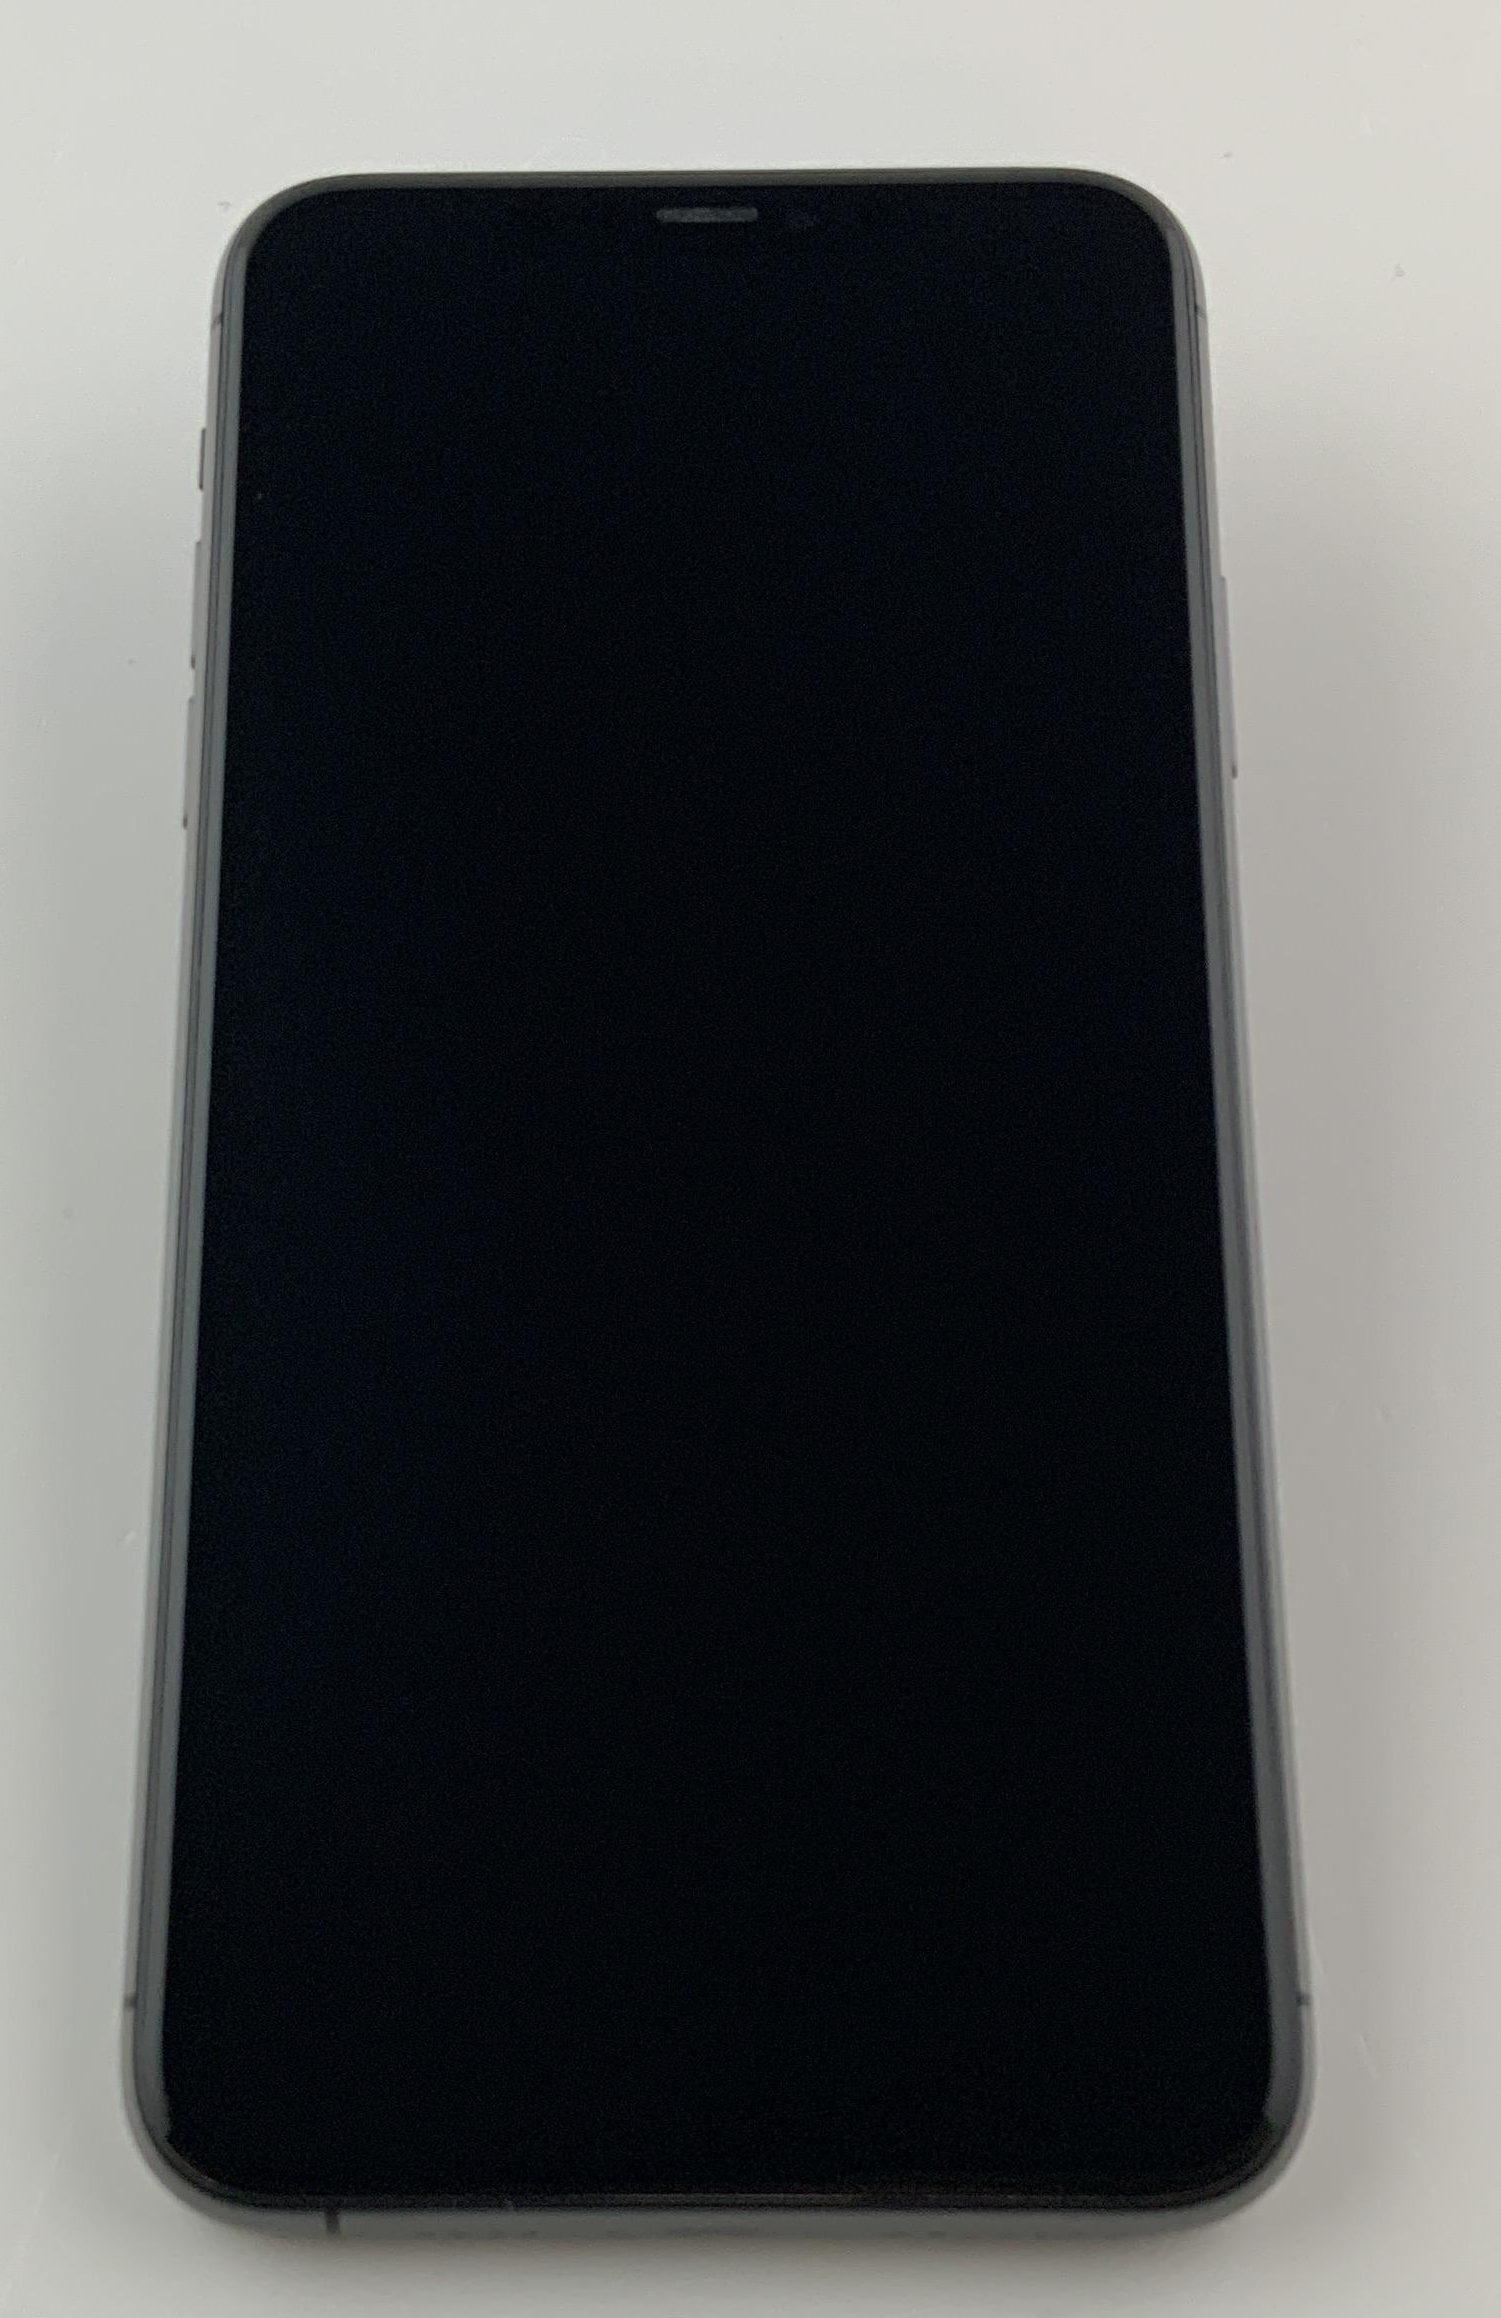 iPhone 11 Pro Max 64GB, 64GB, Space Gray, image 1